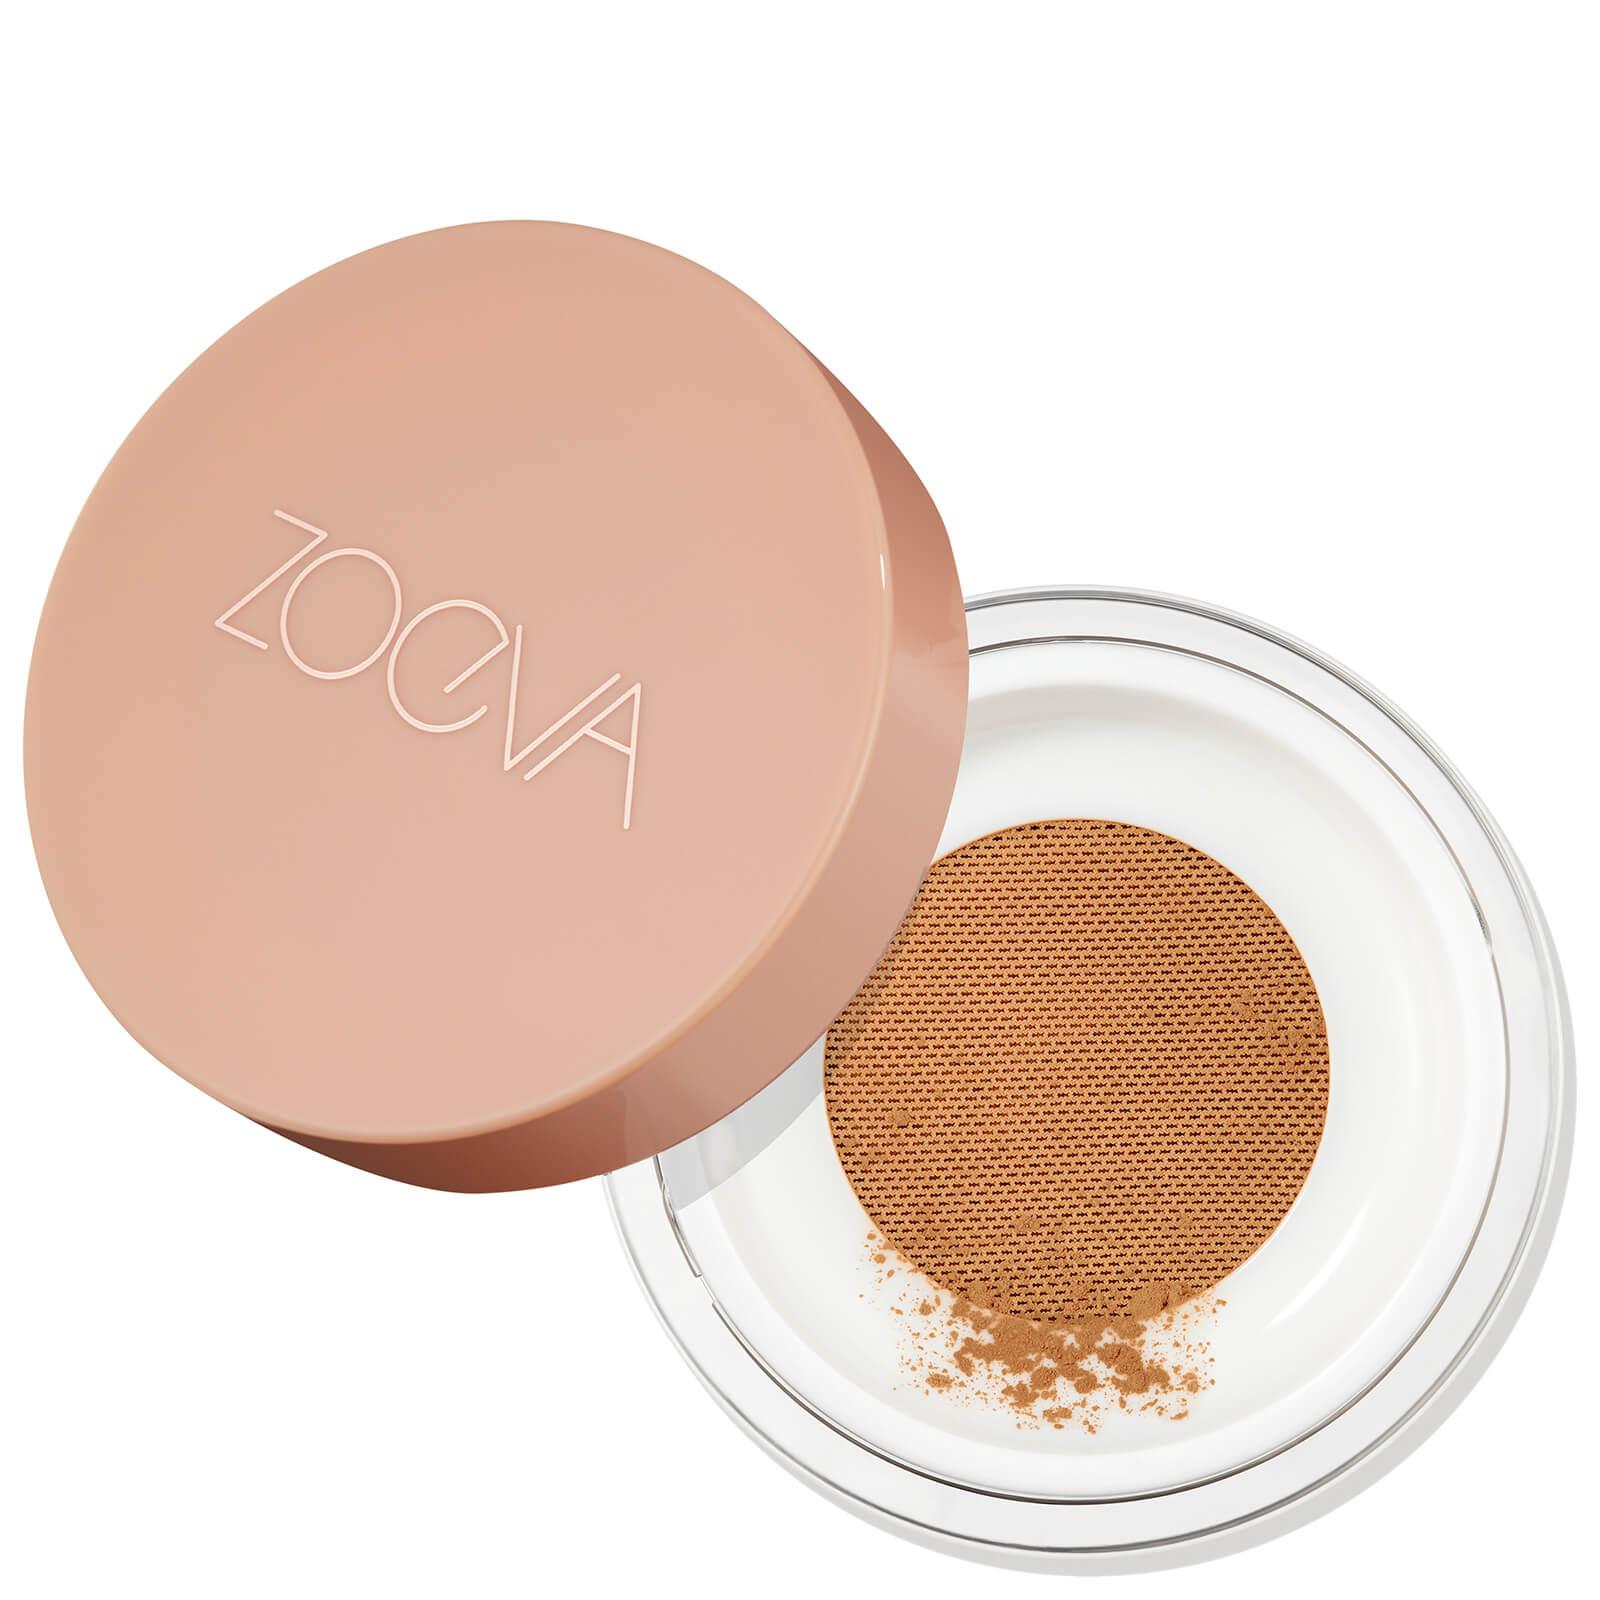 Купить ZOEVA Authentik Skin Finishing Powder 14g (Various Shades) - Excellent